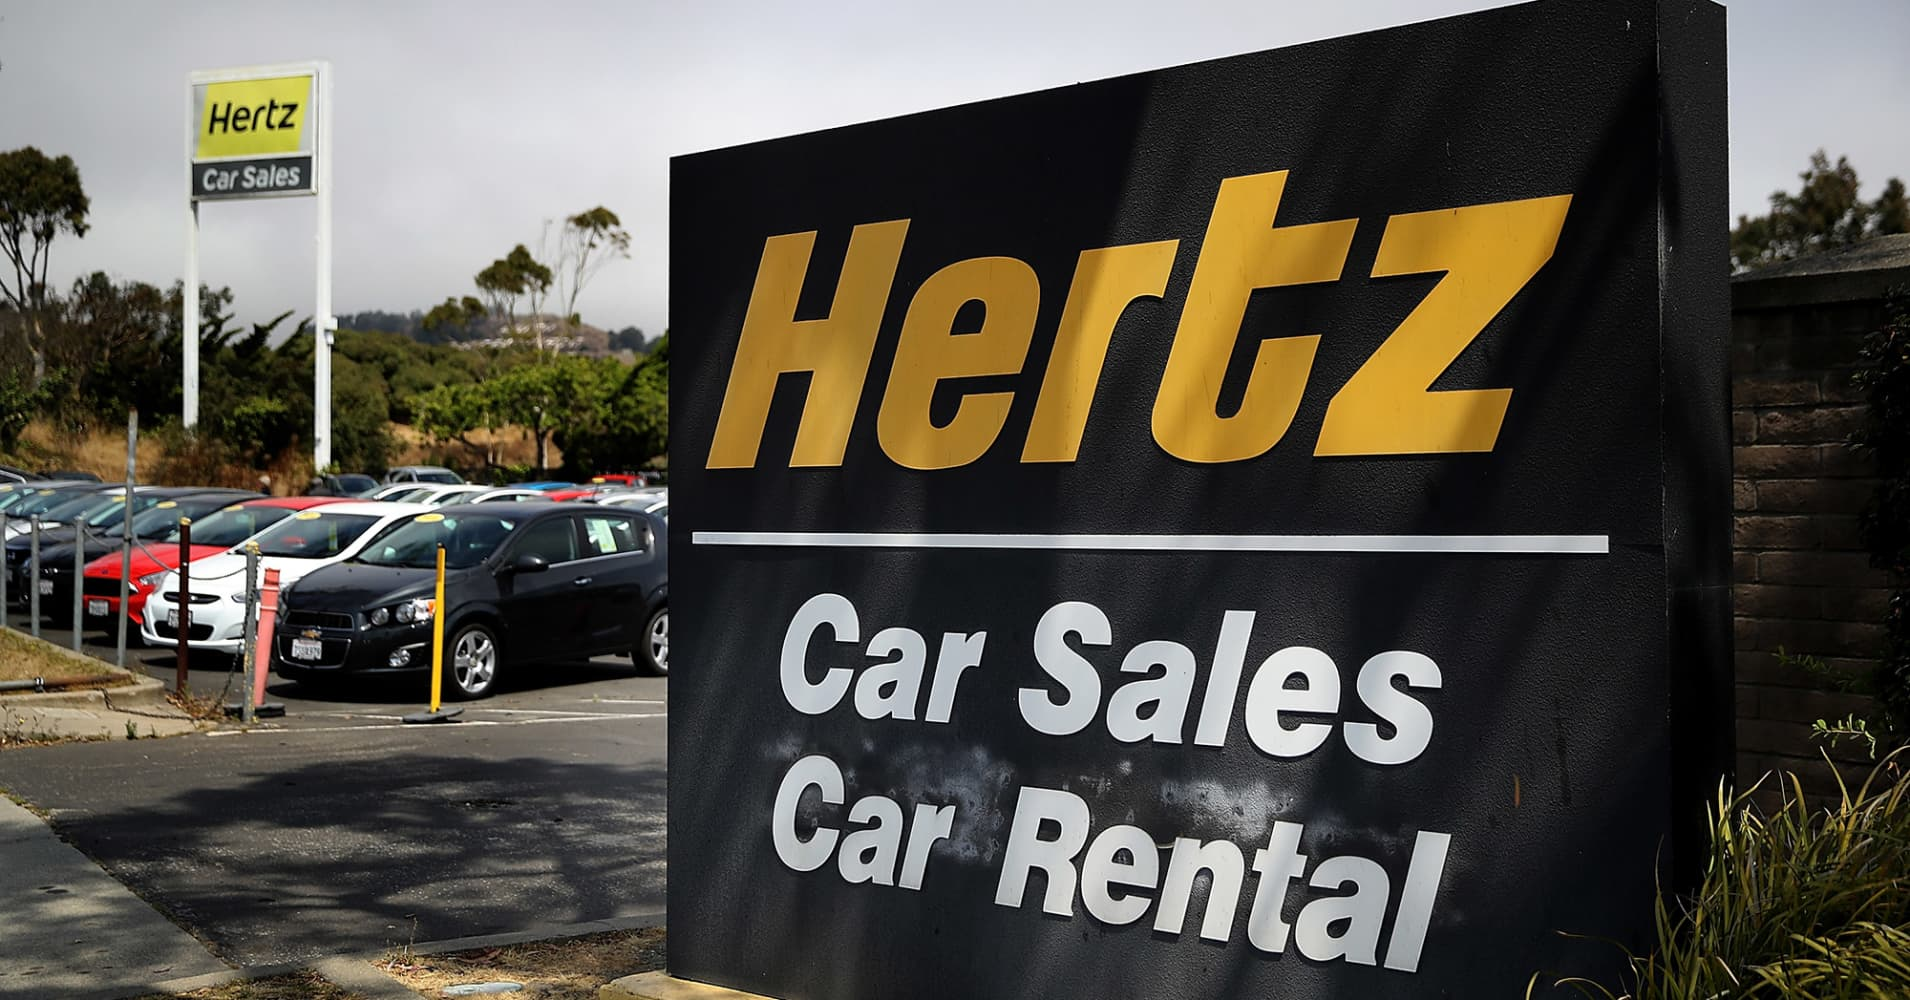 Hertz Launches Biometric Lanes To Make Car Renting Faster